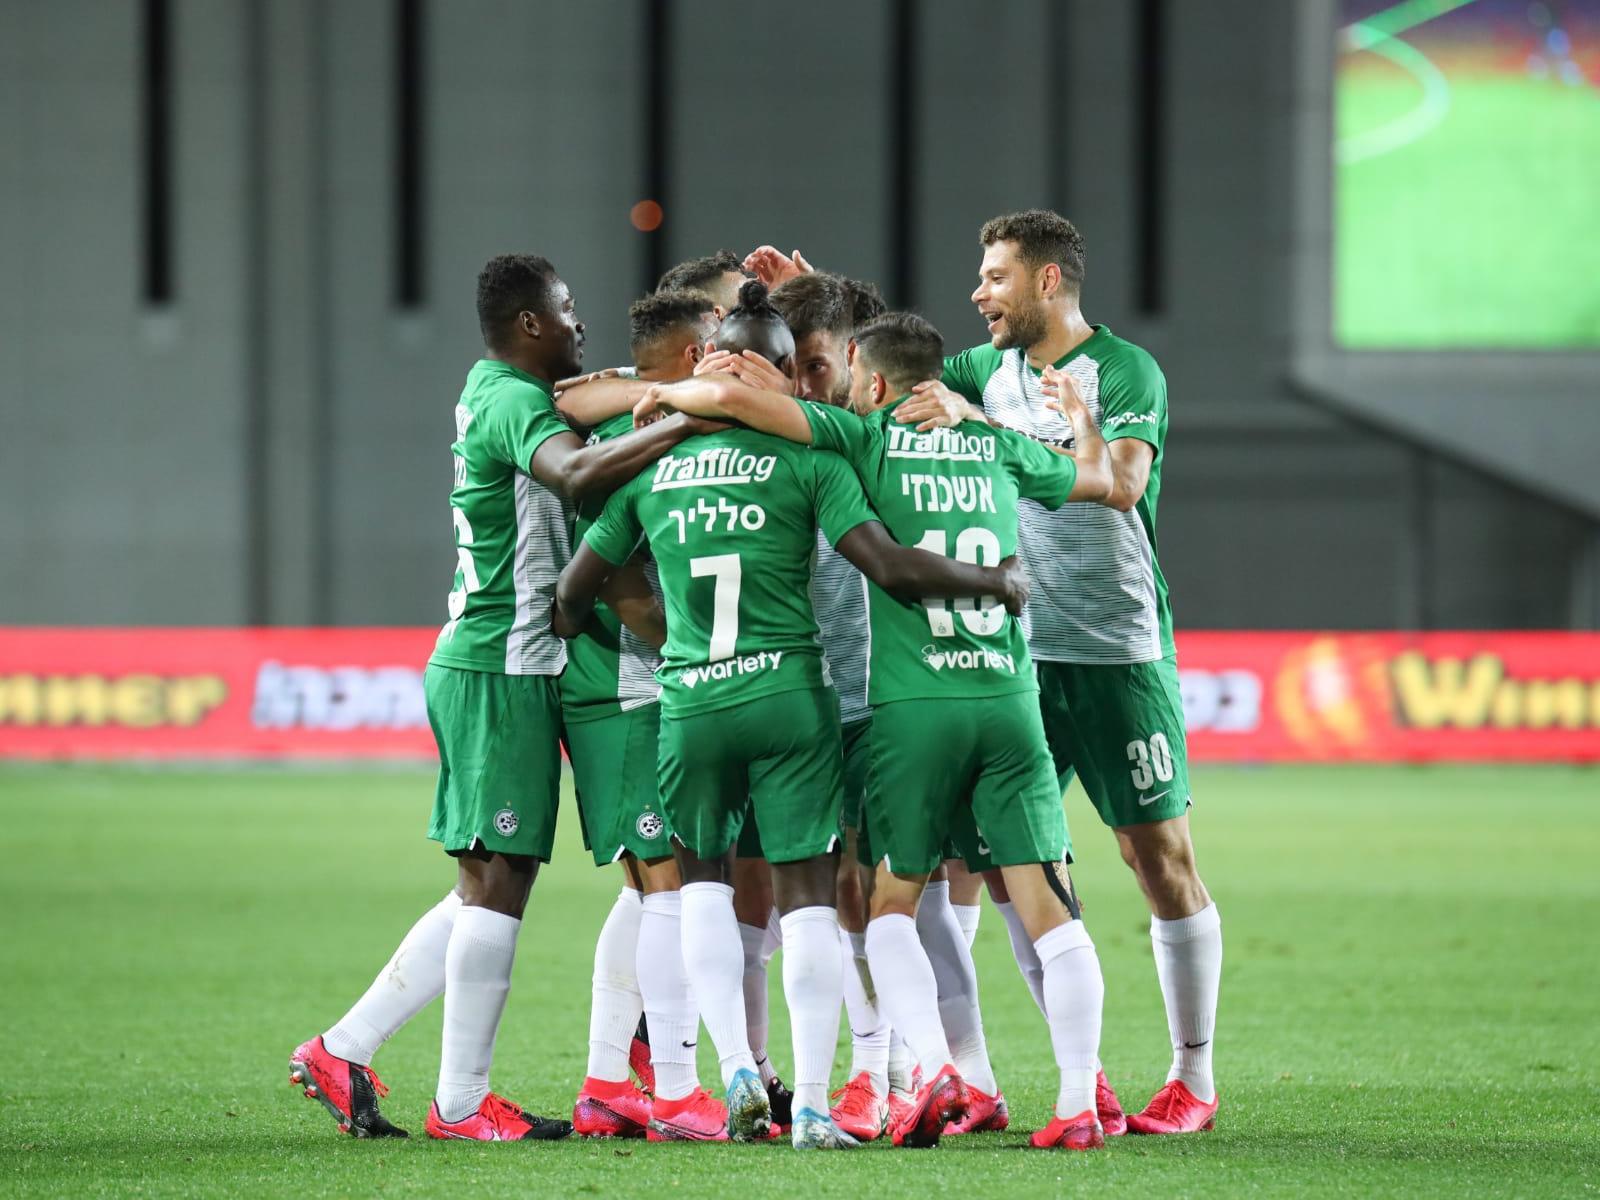 Maccabi defeats Be'er Sheva 4:0